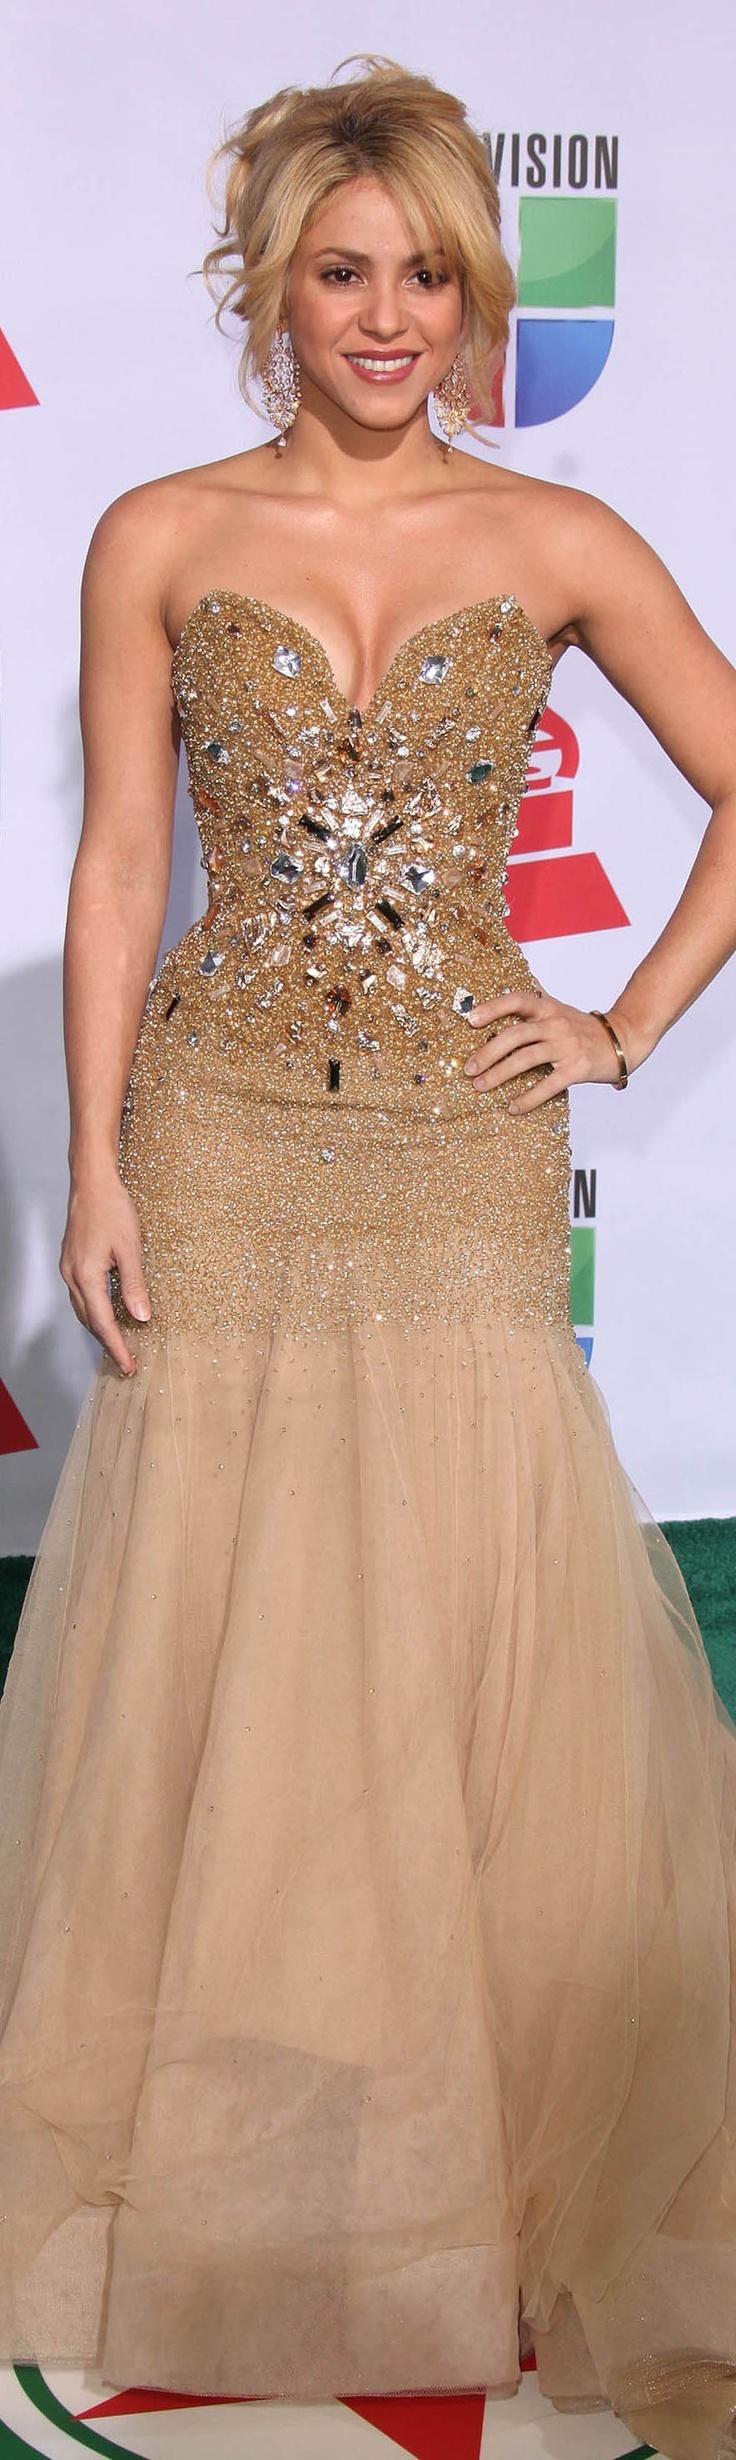 Shakira gold dress #strapless